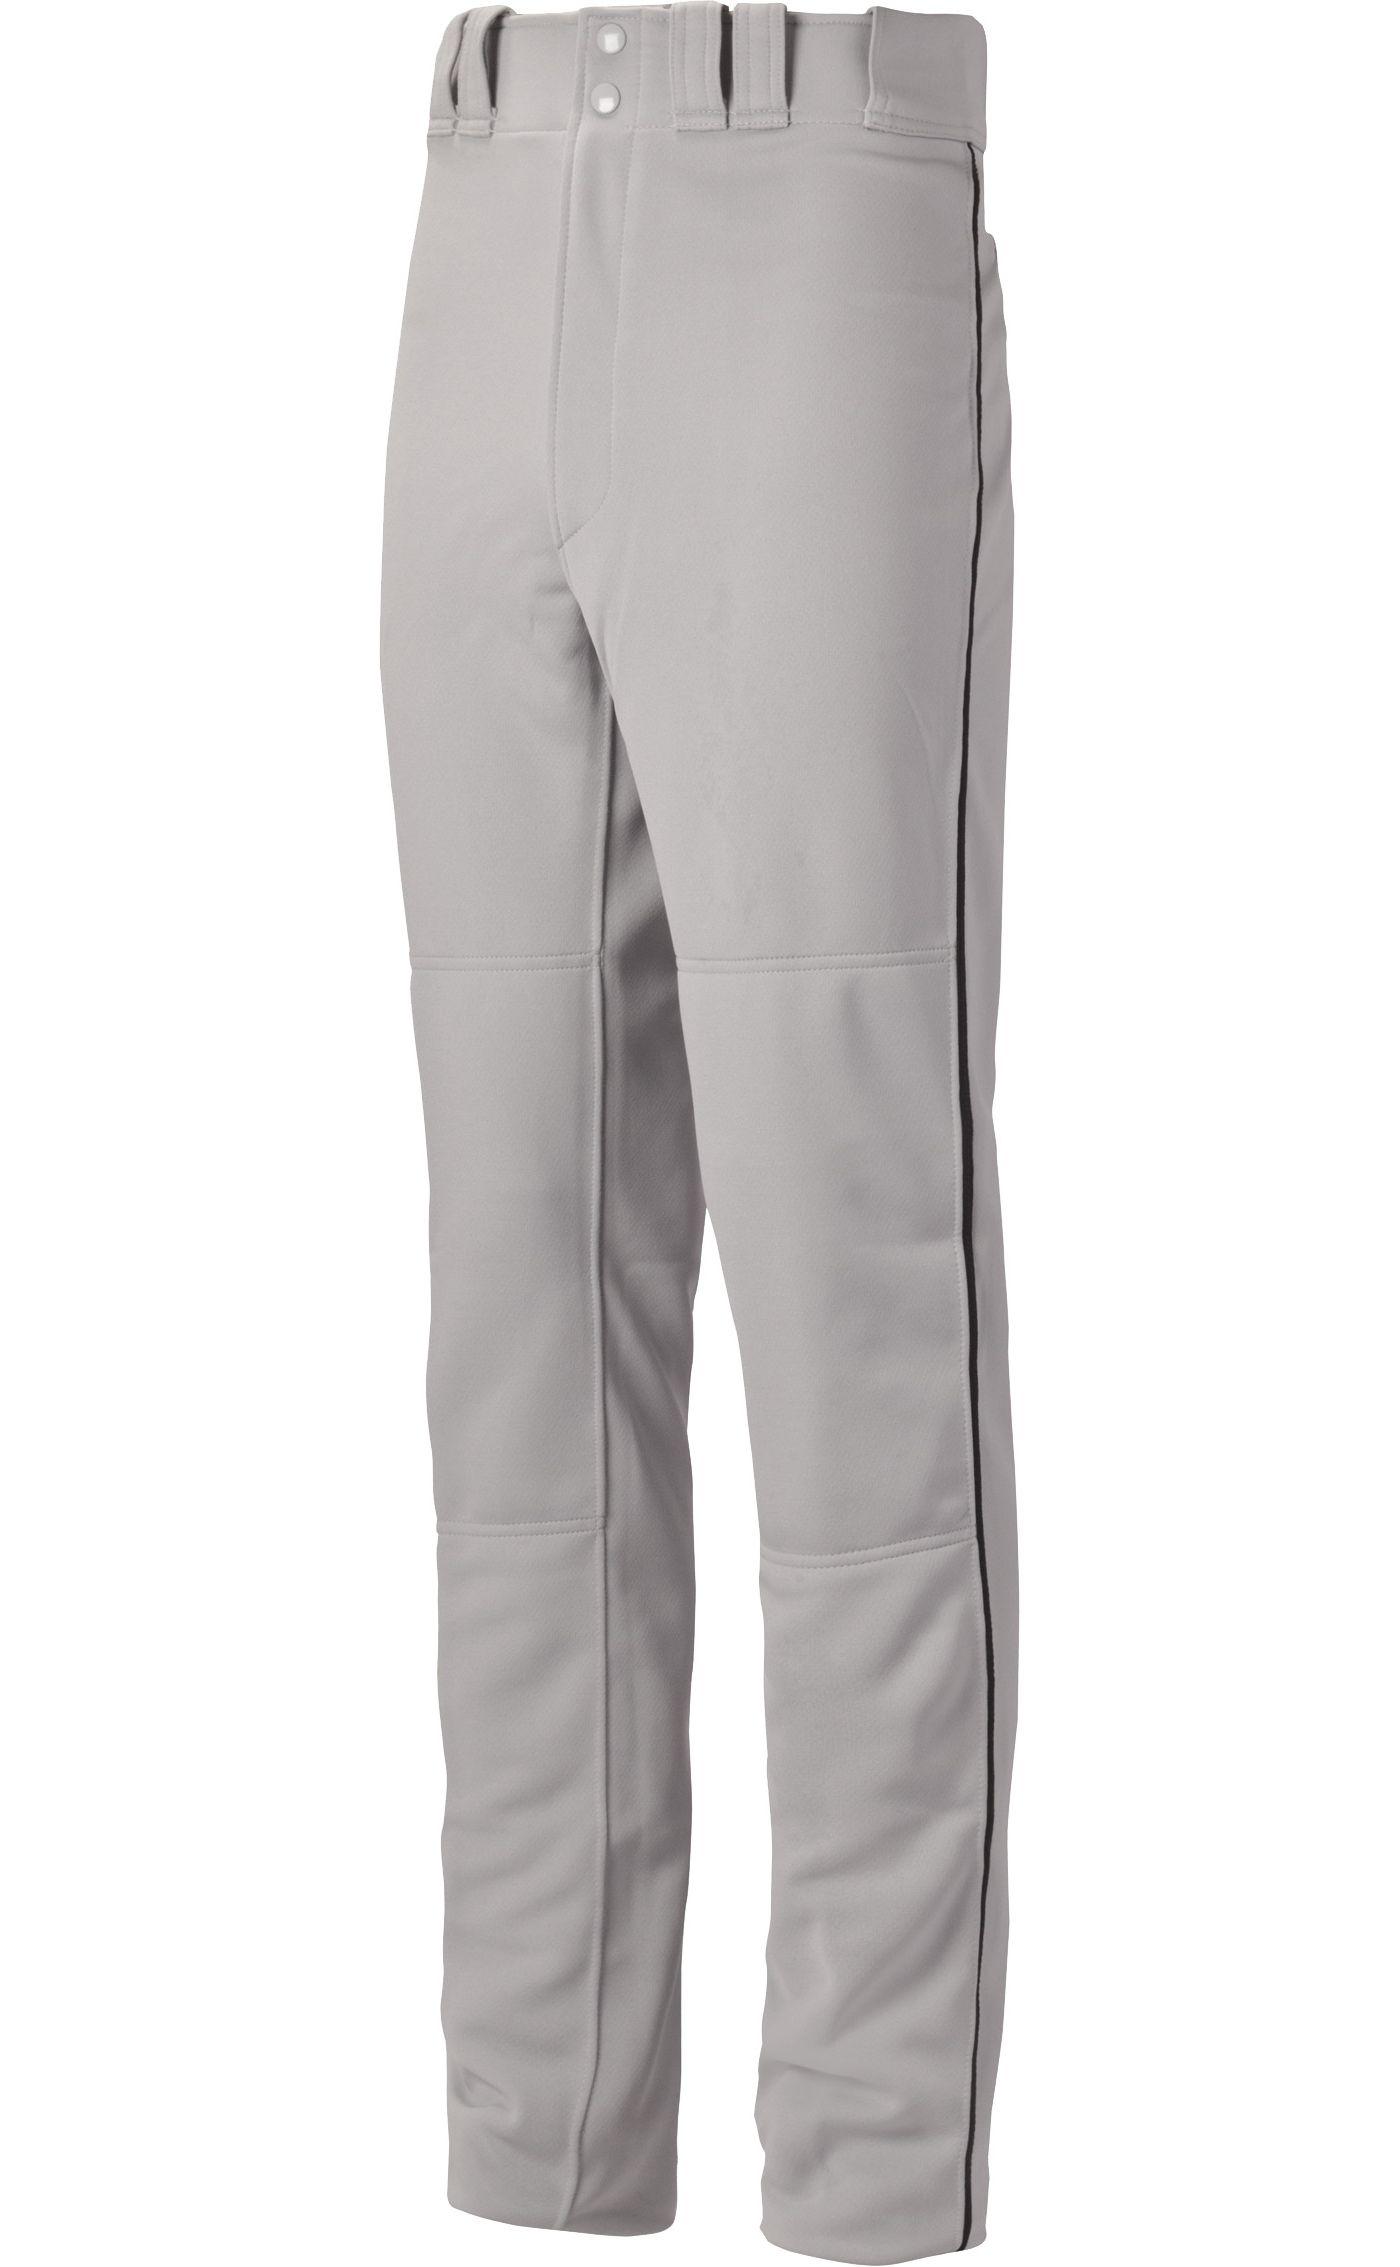 Mizuno Men's Premier Pro Piped Baseball Pants